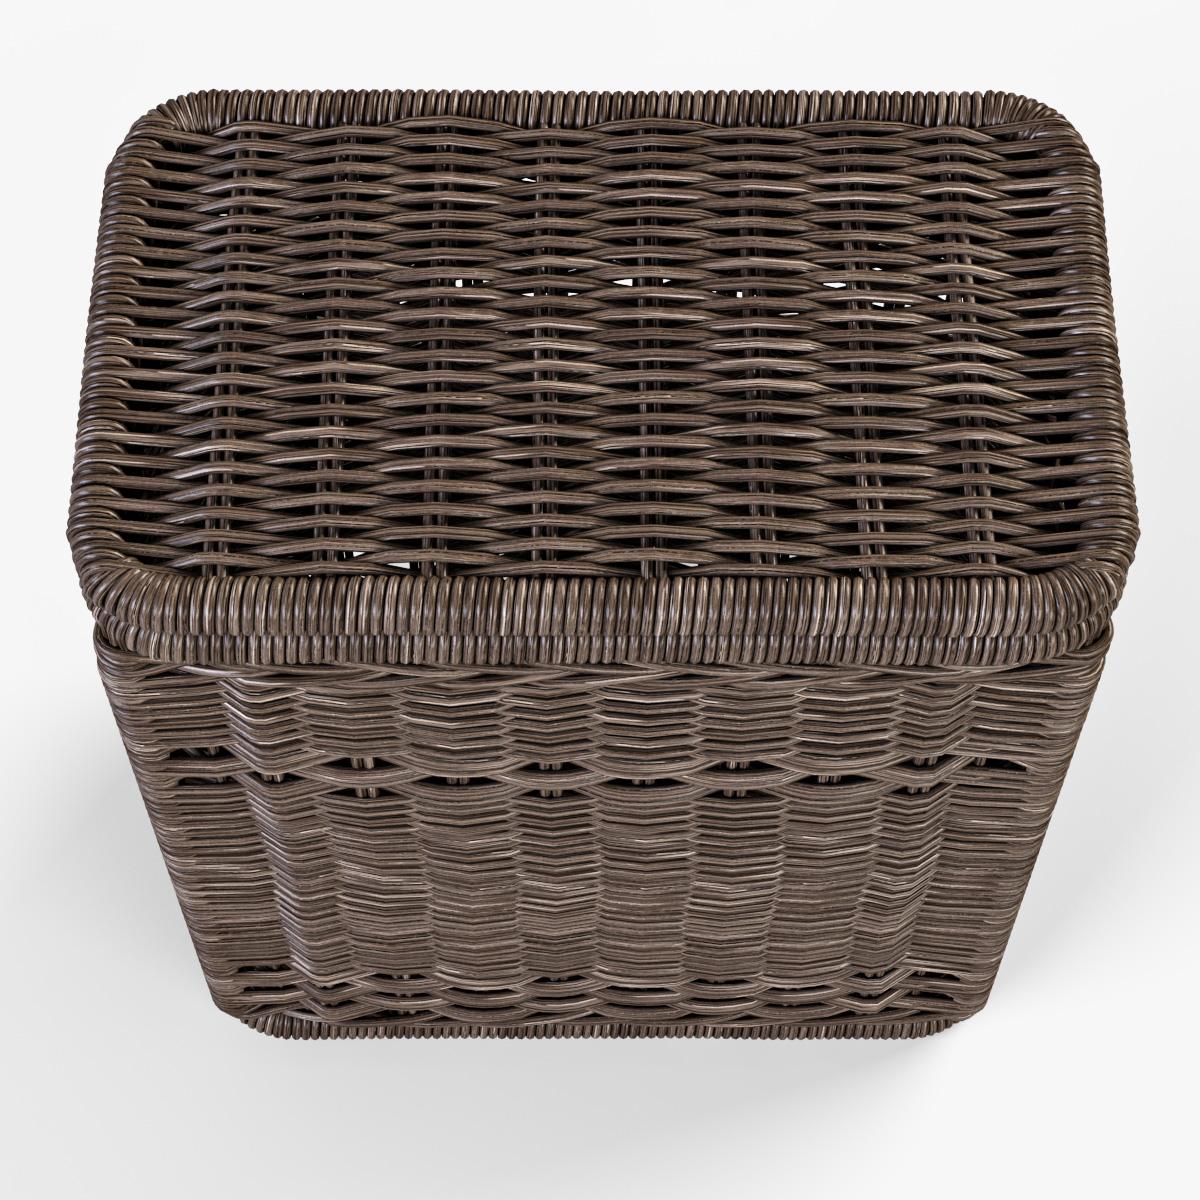 Wicker Laundry Hamper 08 Brown Color By Markelos 3docean